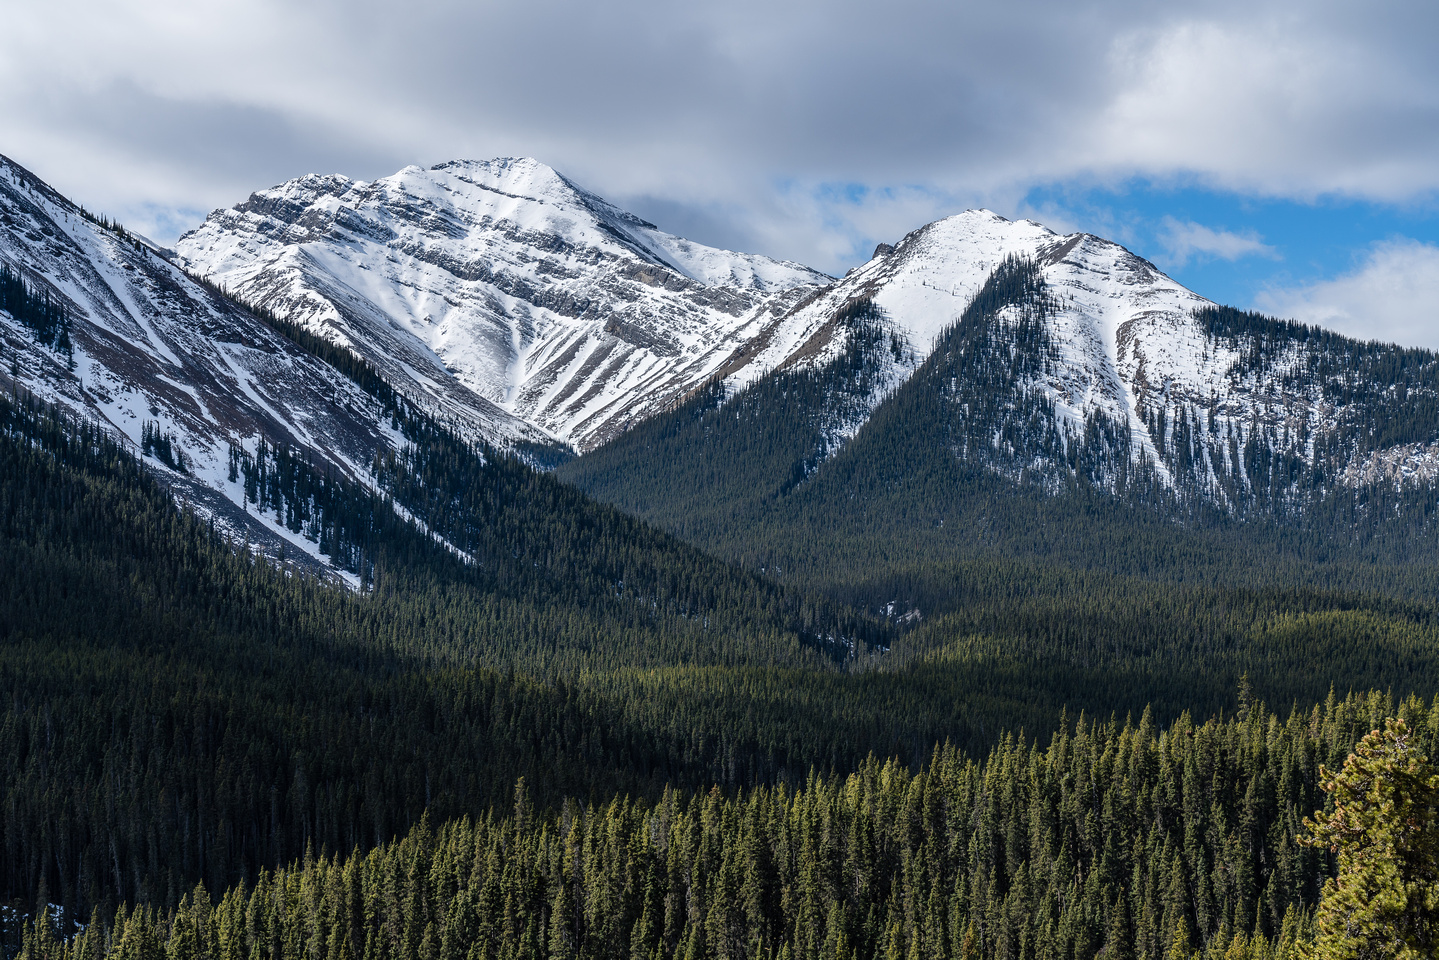 Otuskwan Peak looks great from this angle.